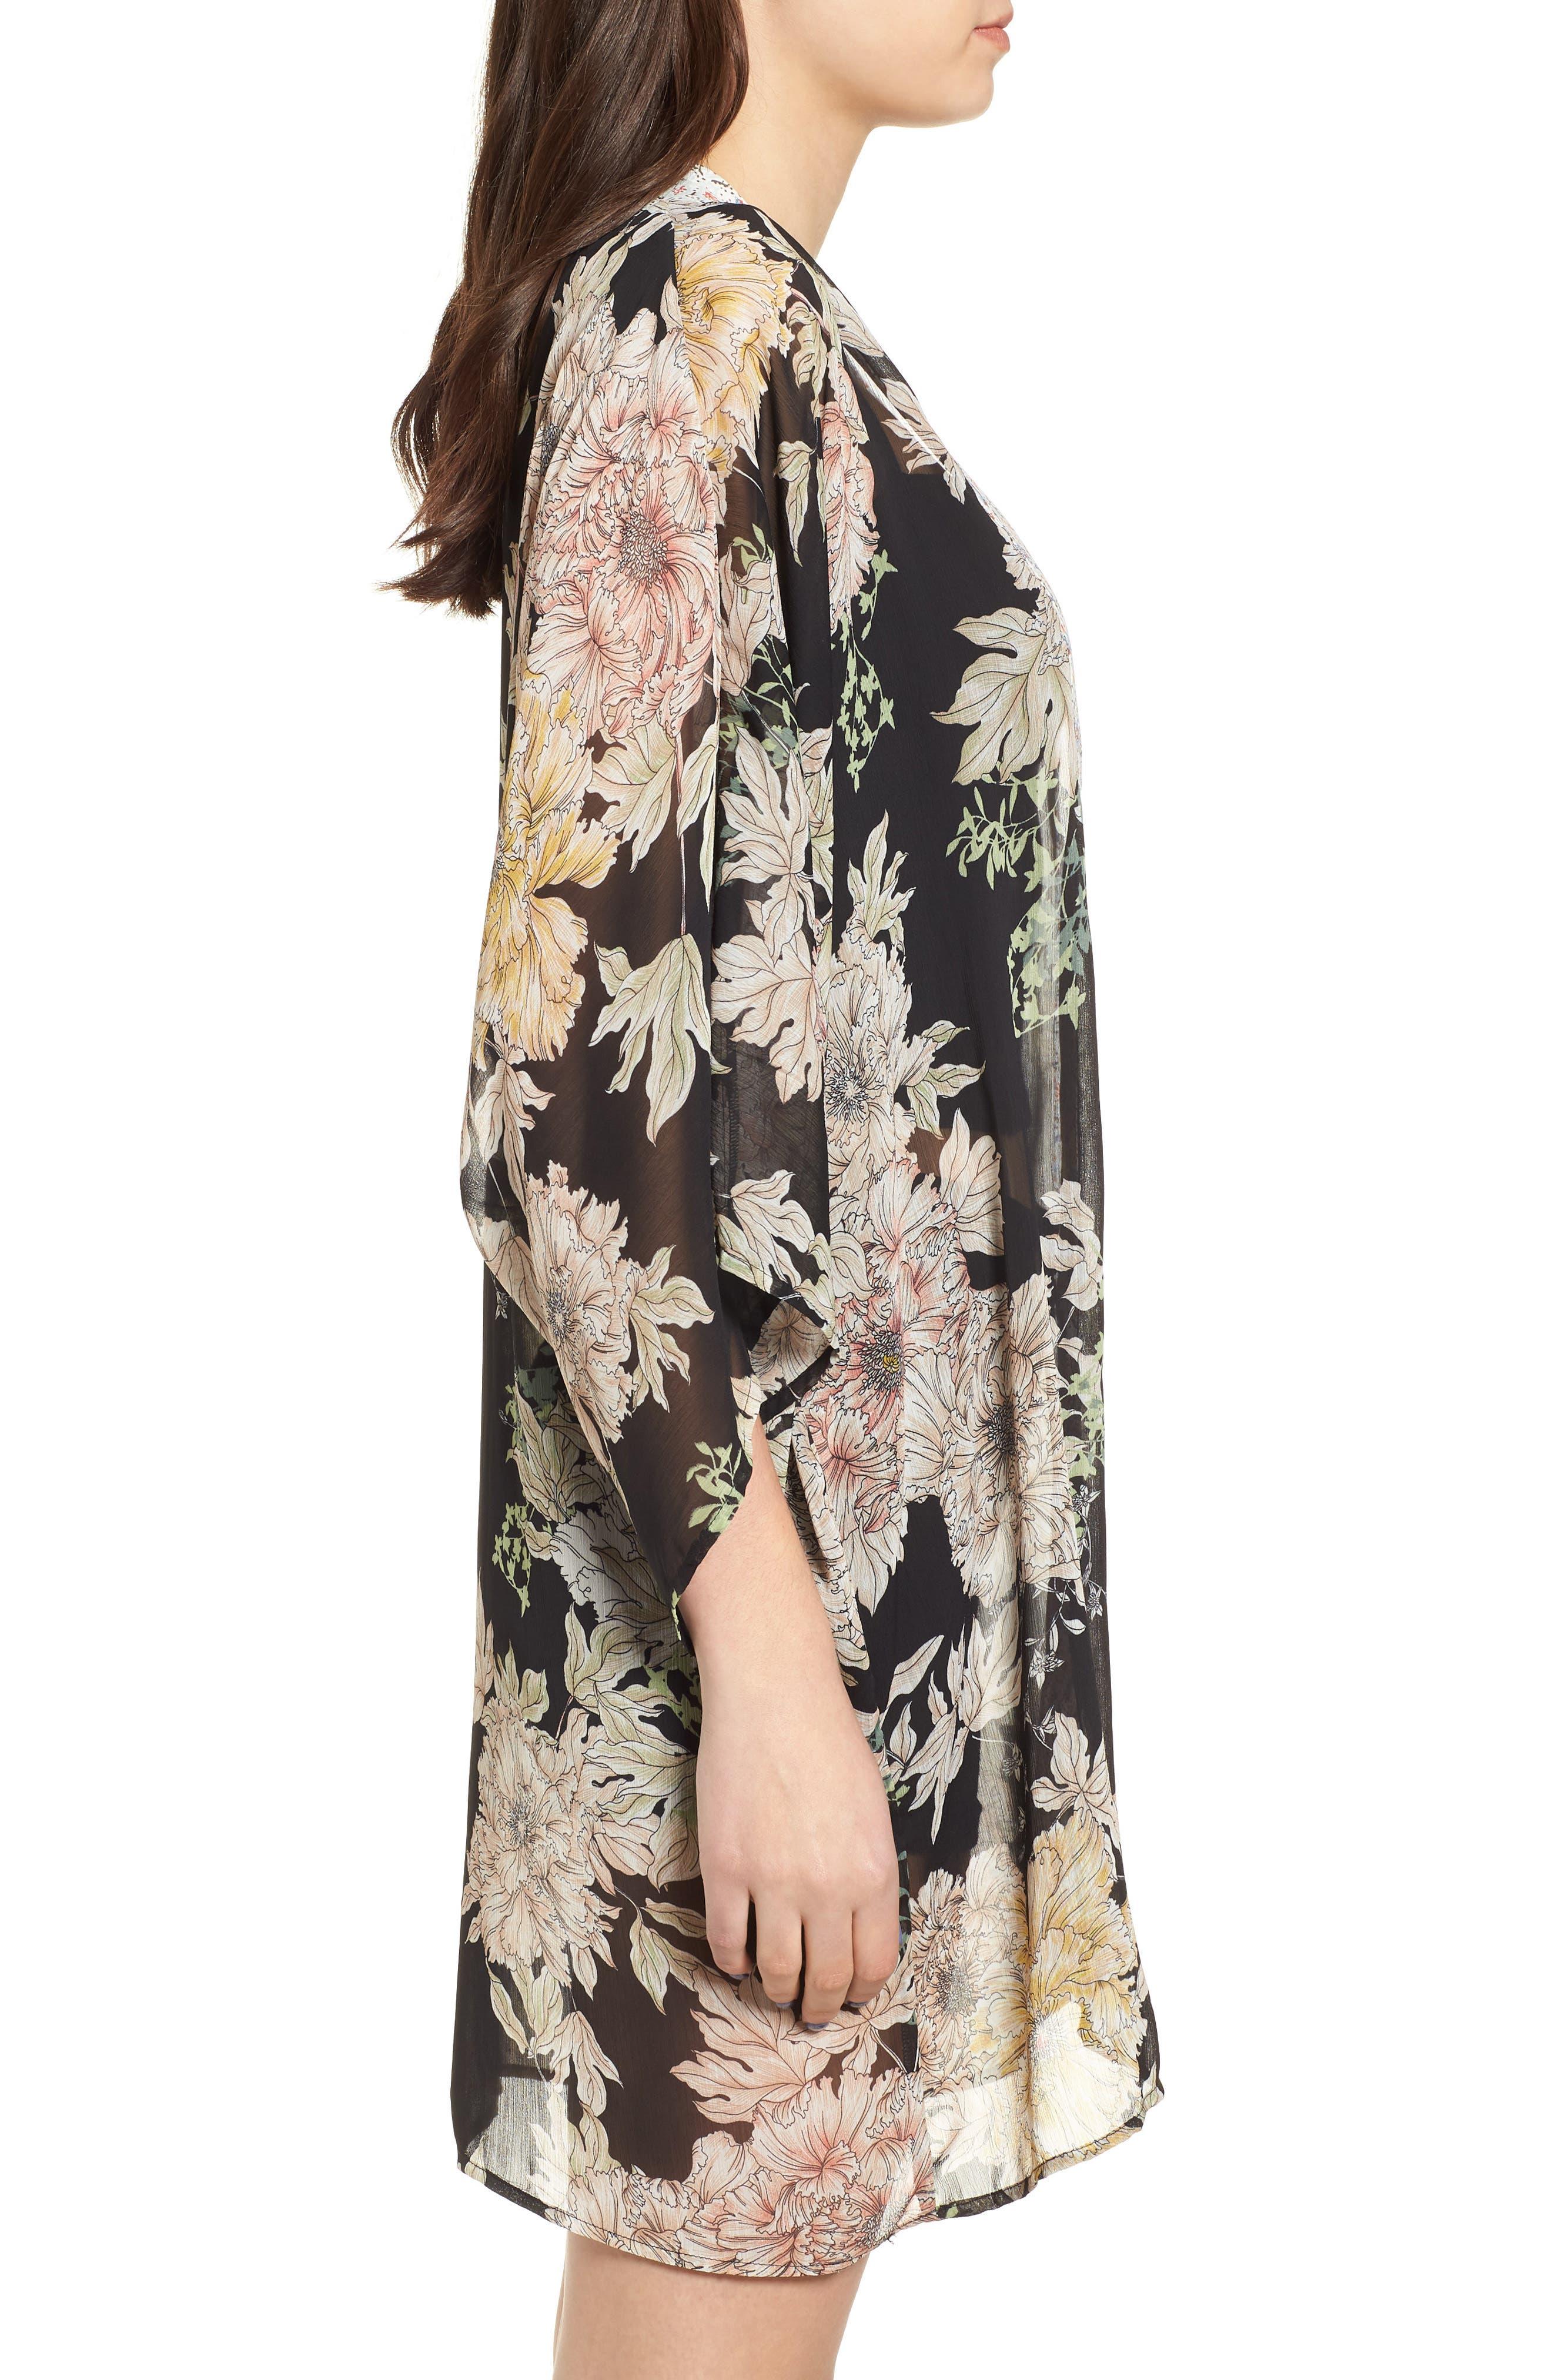 Floral Print Kimono,                             Alternate thumbnail 3, color,                             Black Gold Pink